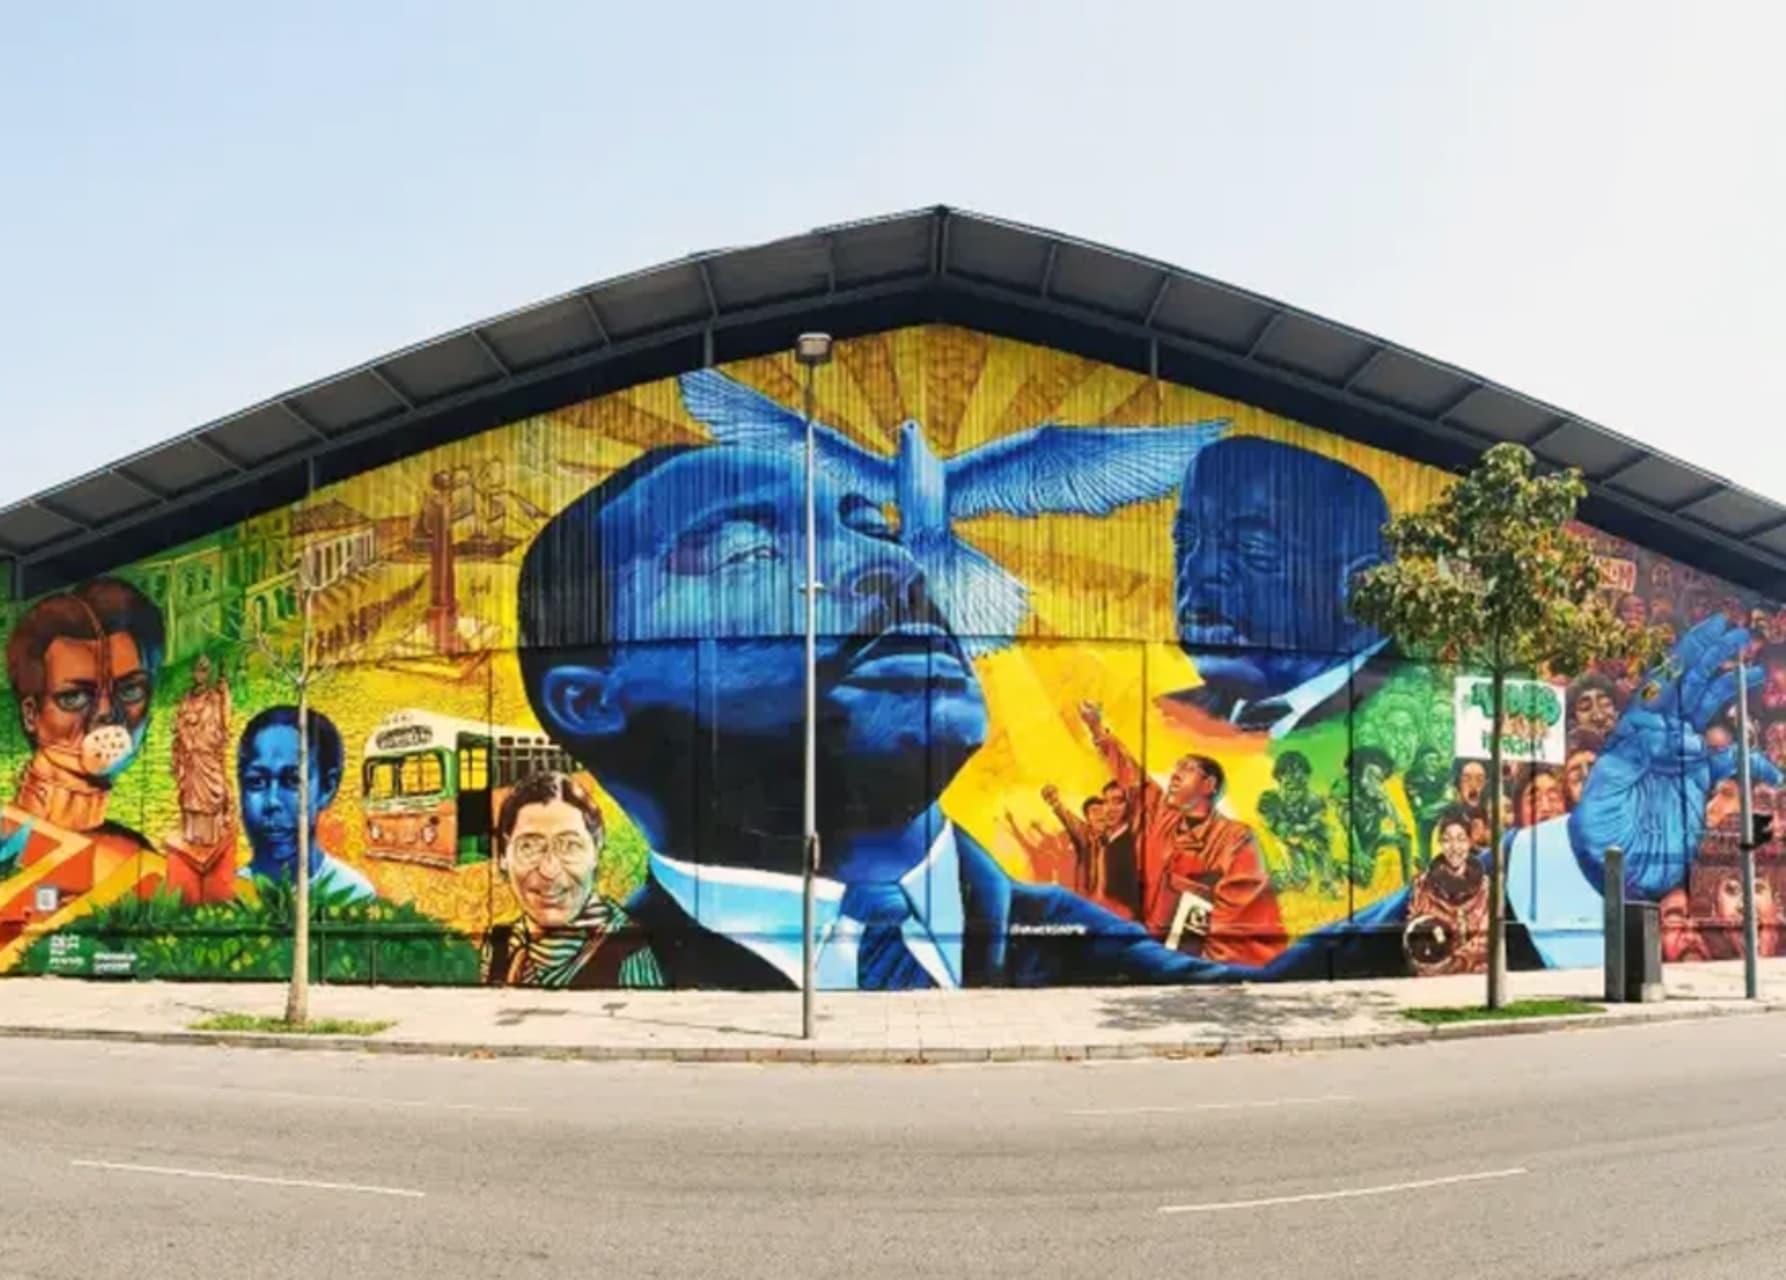 Rio de Janeiro - Porto Art District: The Art of Graffiti in Rio de Janeiro!